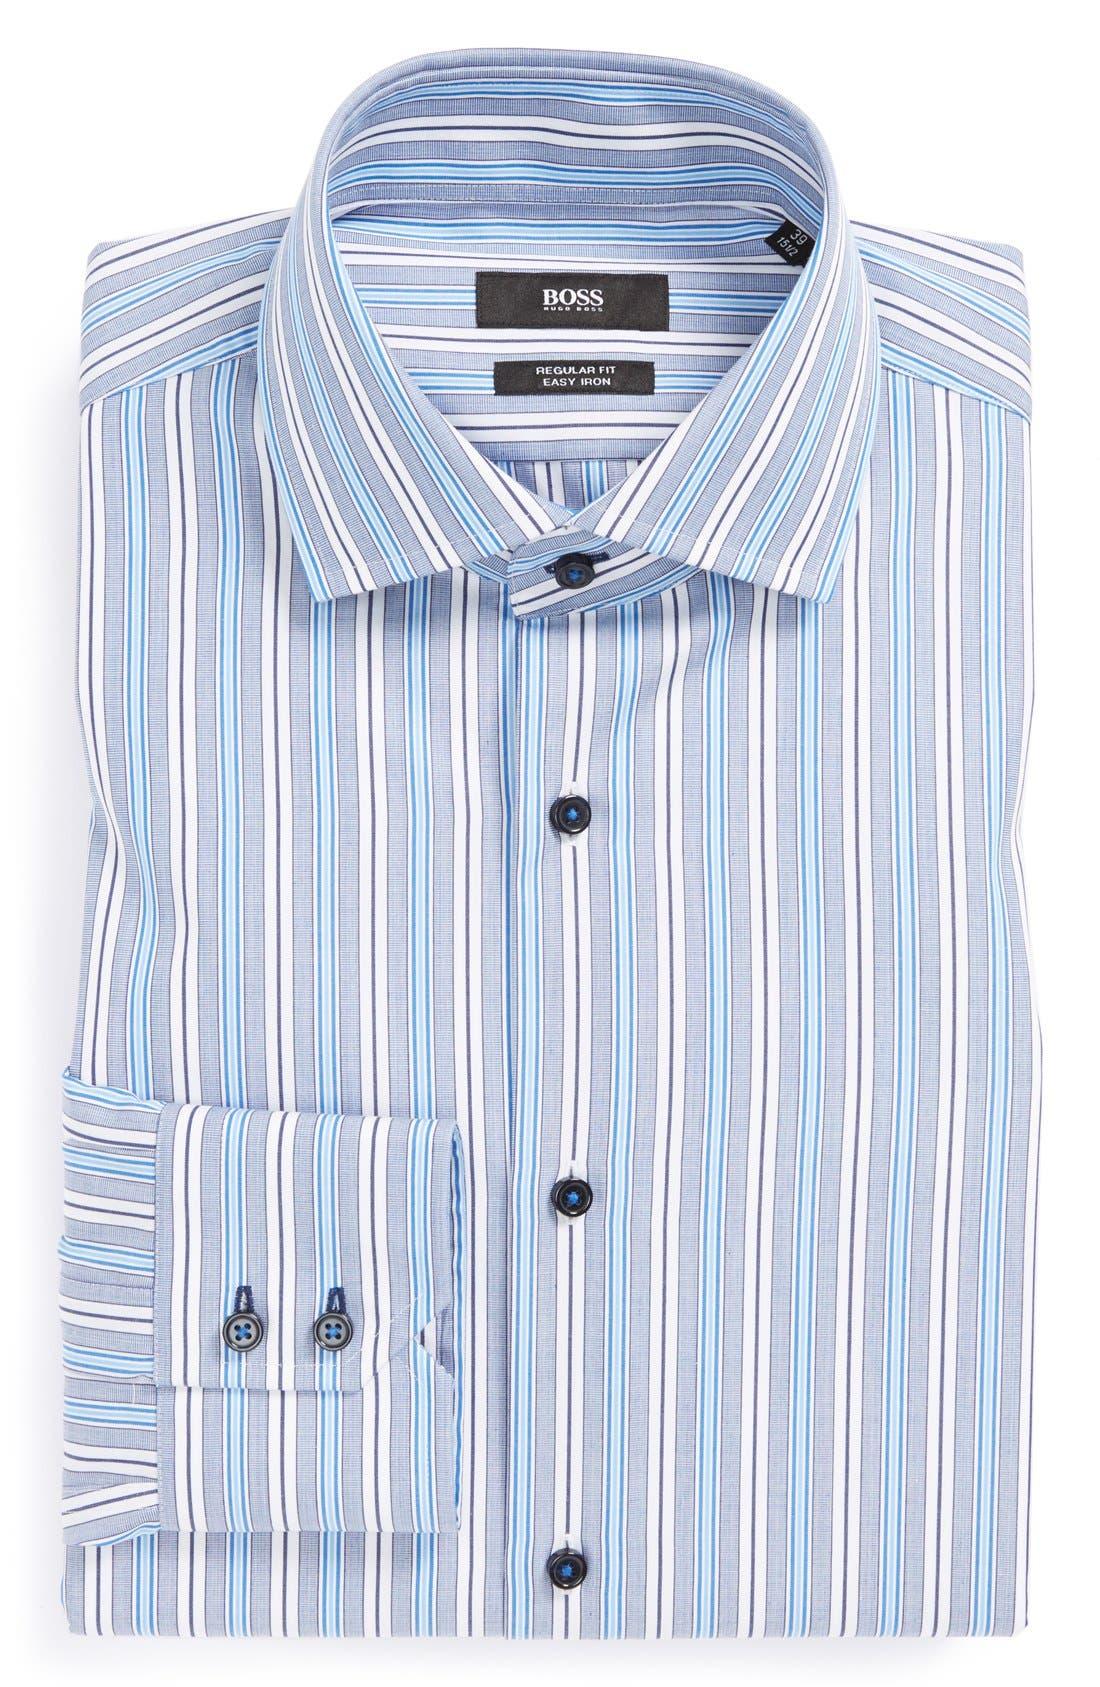 Main Image - BOSS HUGO BOSS 'Gorman' WW Regular Fit Easy Iron Stripe Dress Shirt